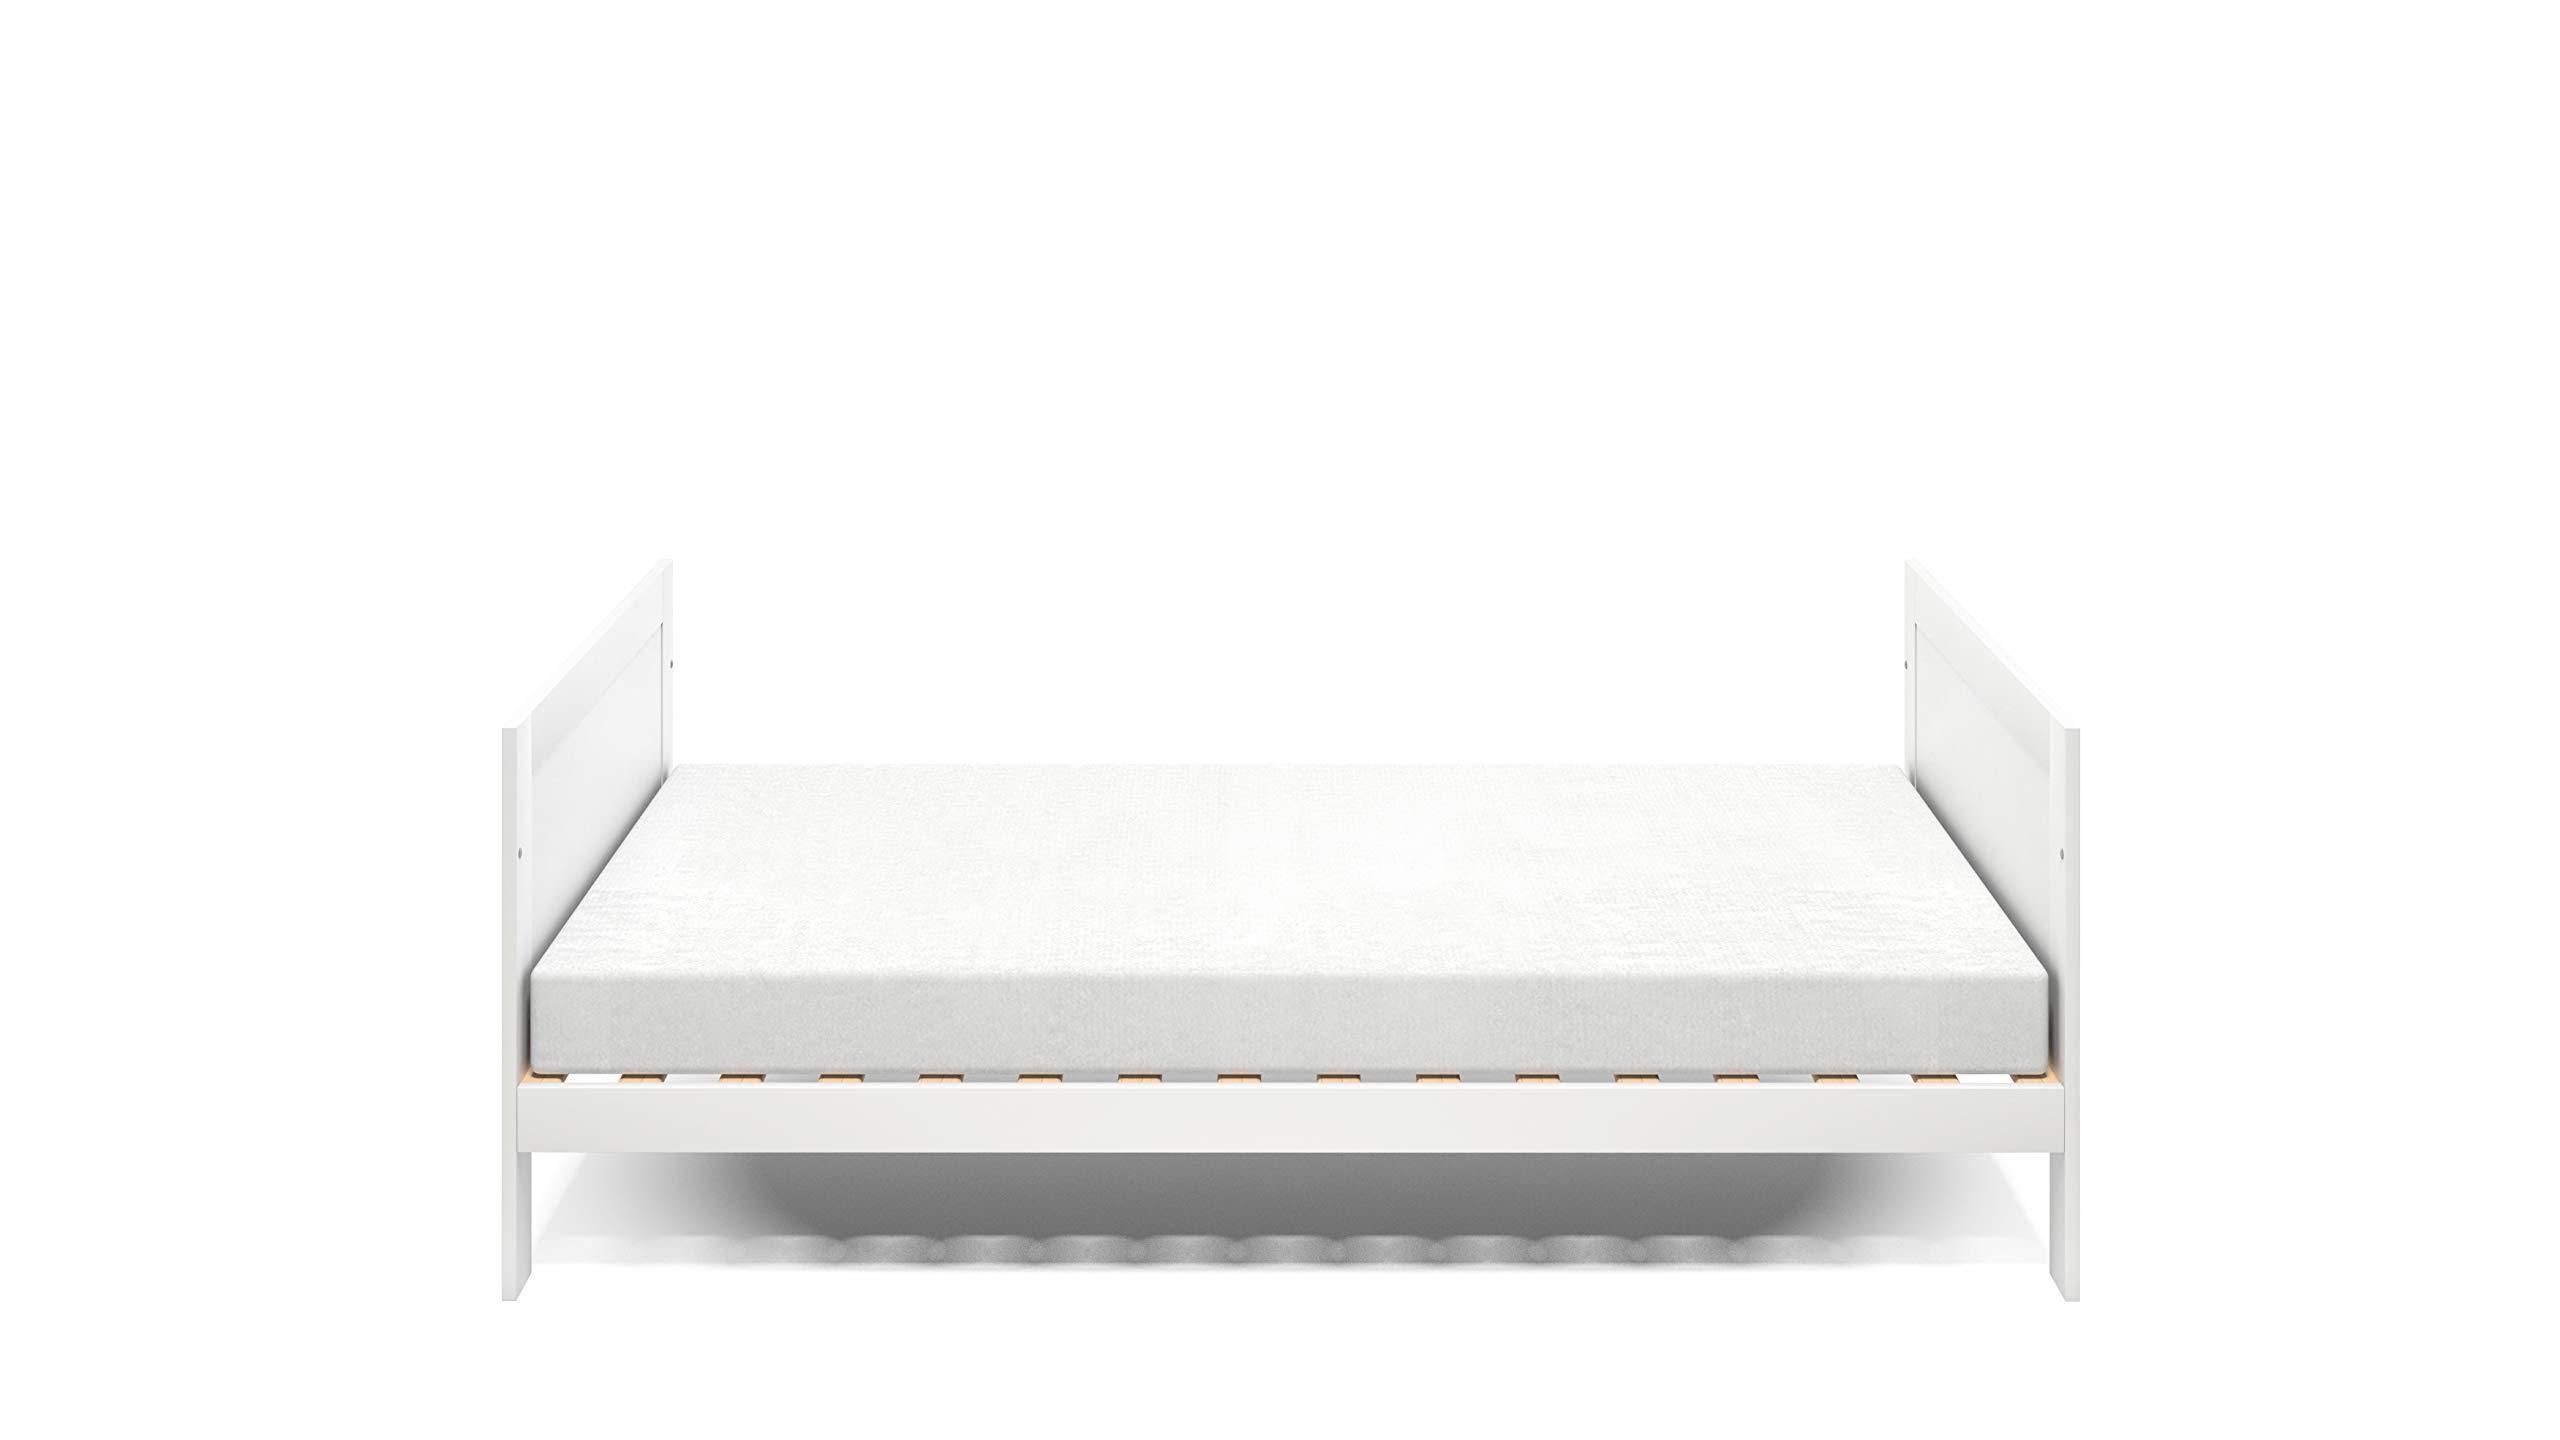 Silver Cross Derwent Cot Bed, Mattress and Dresser bundle